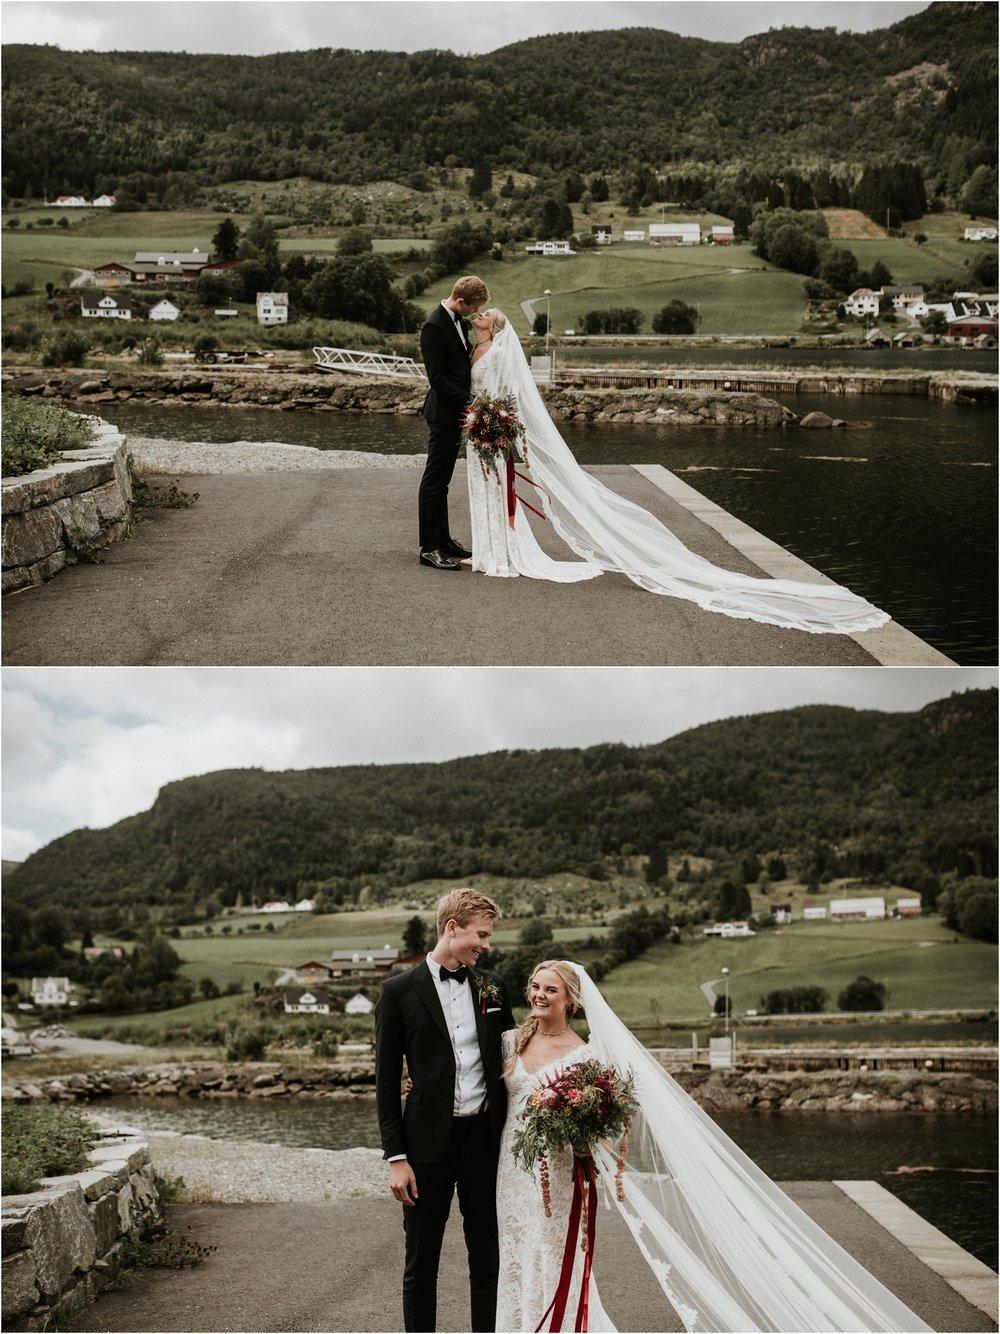 Norway-wedding-photographer-139.jpg